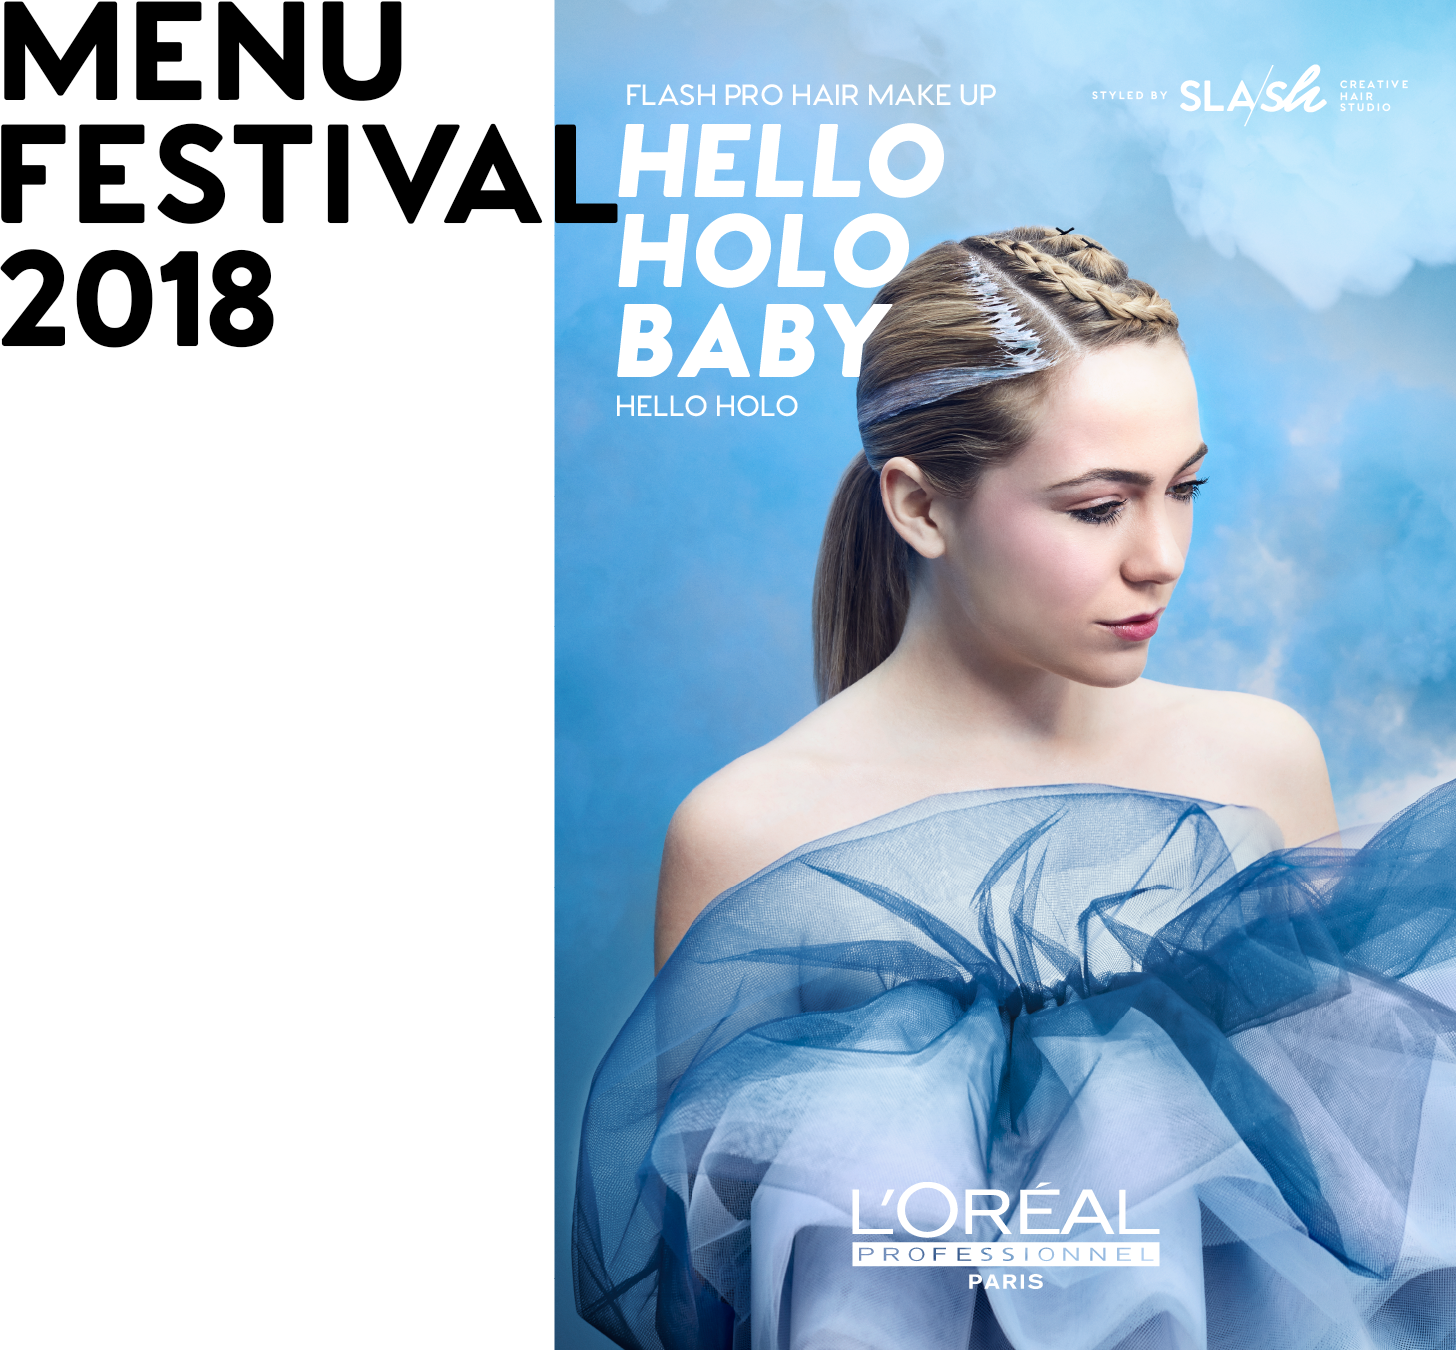 menu-festival-2018_6_hello_holo_baby